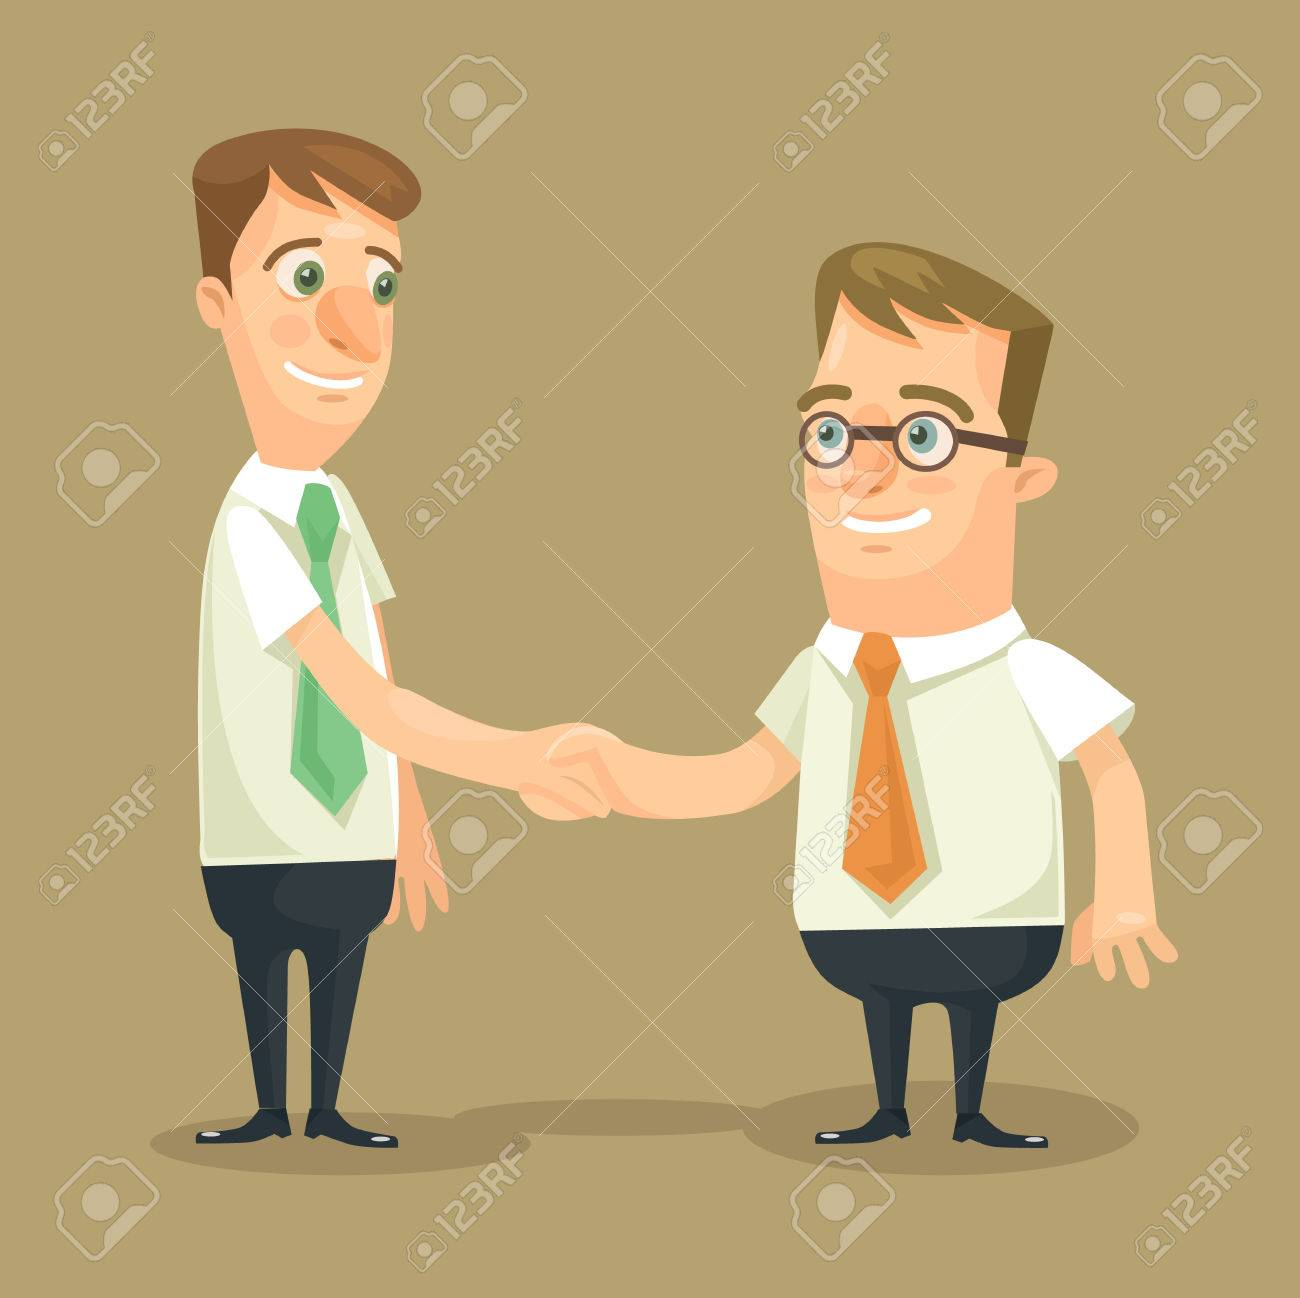 Businessman shaking hands. Vector flat illustration - 48675631